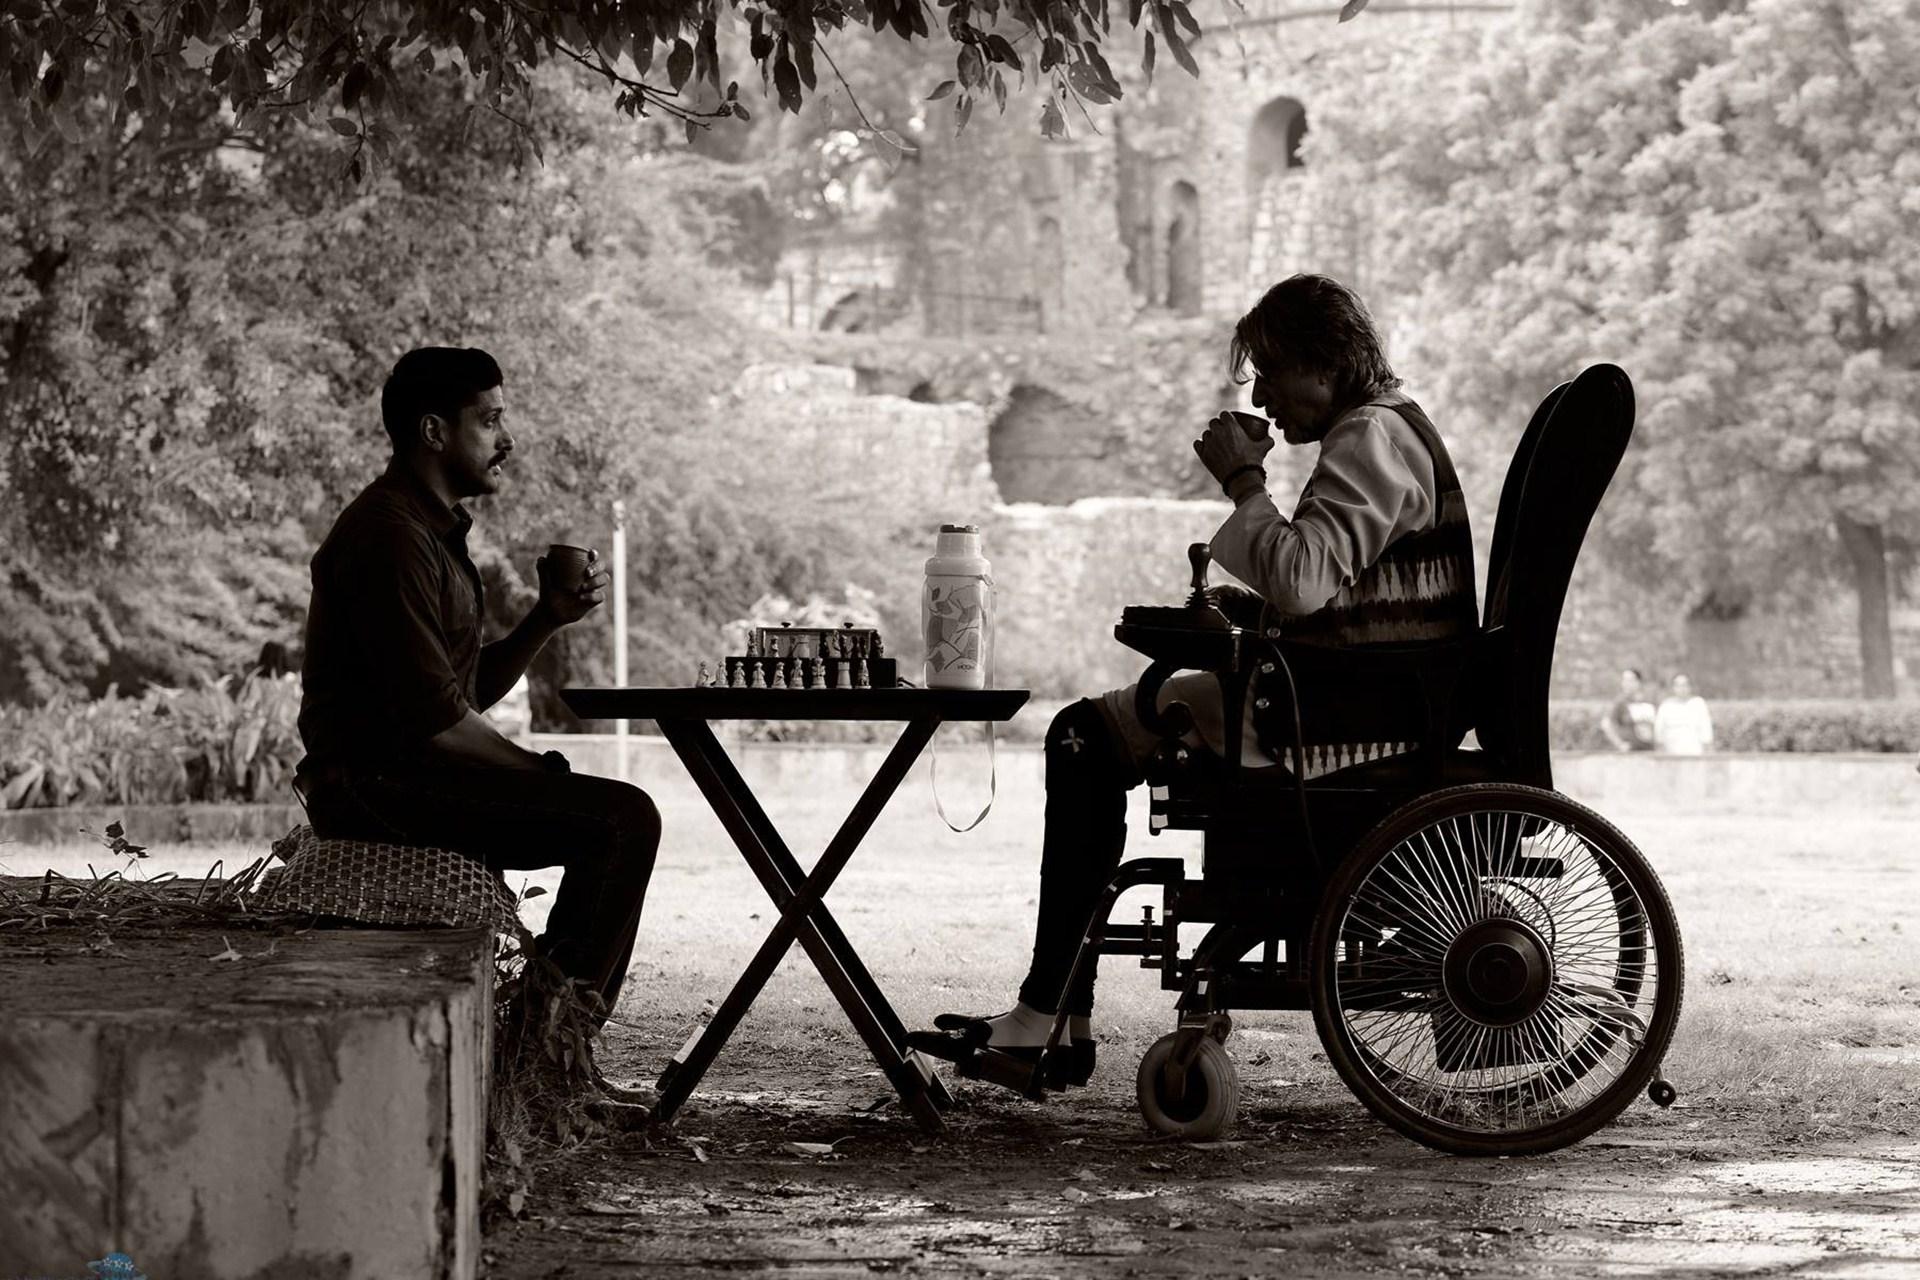 Farhan Akhtar and Amitabh Bachchan on the sets of Wazir